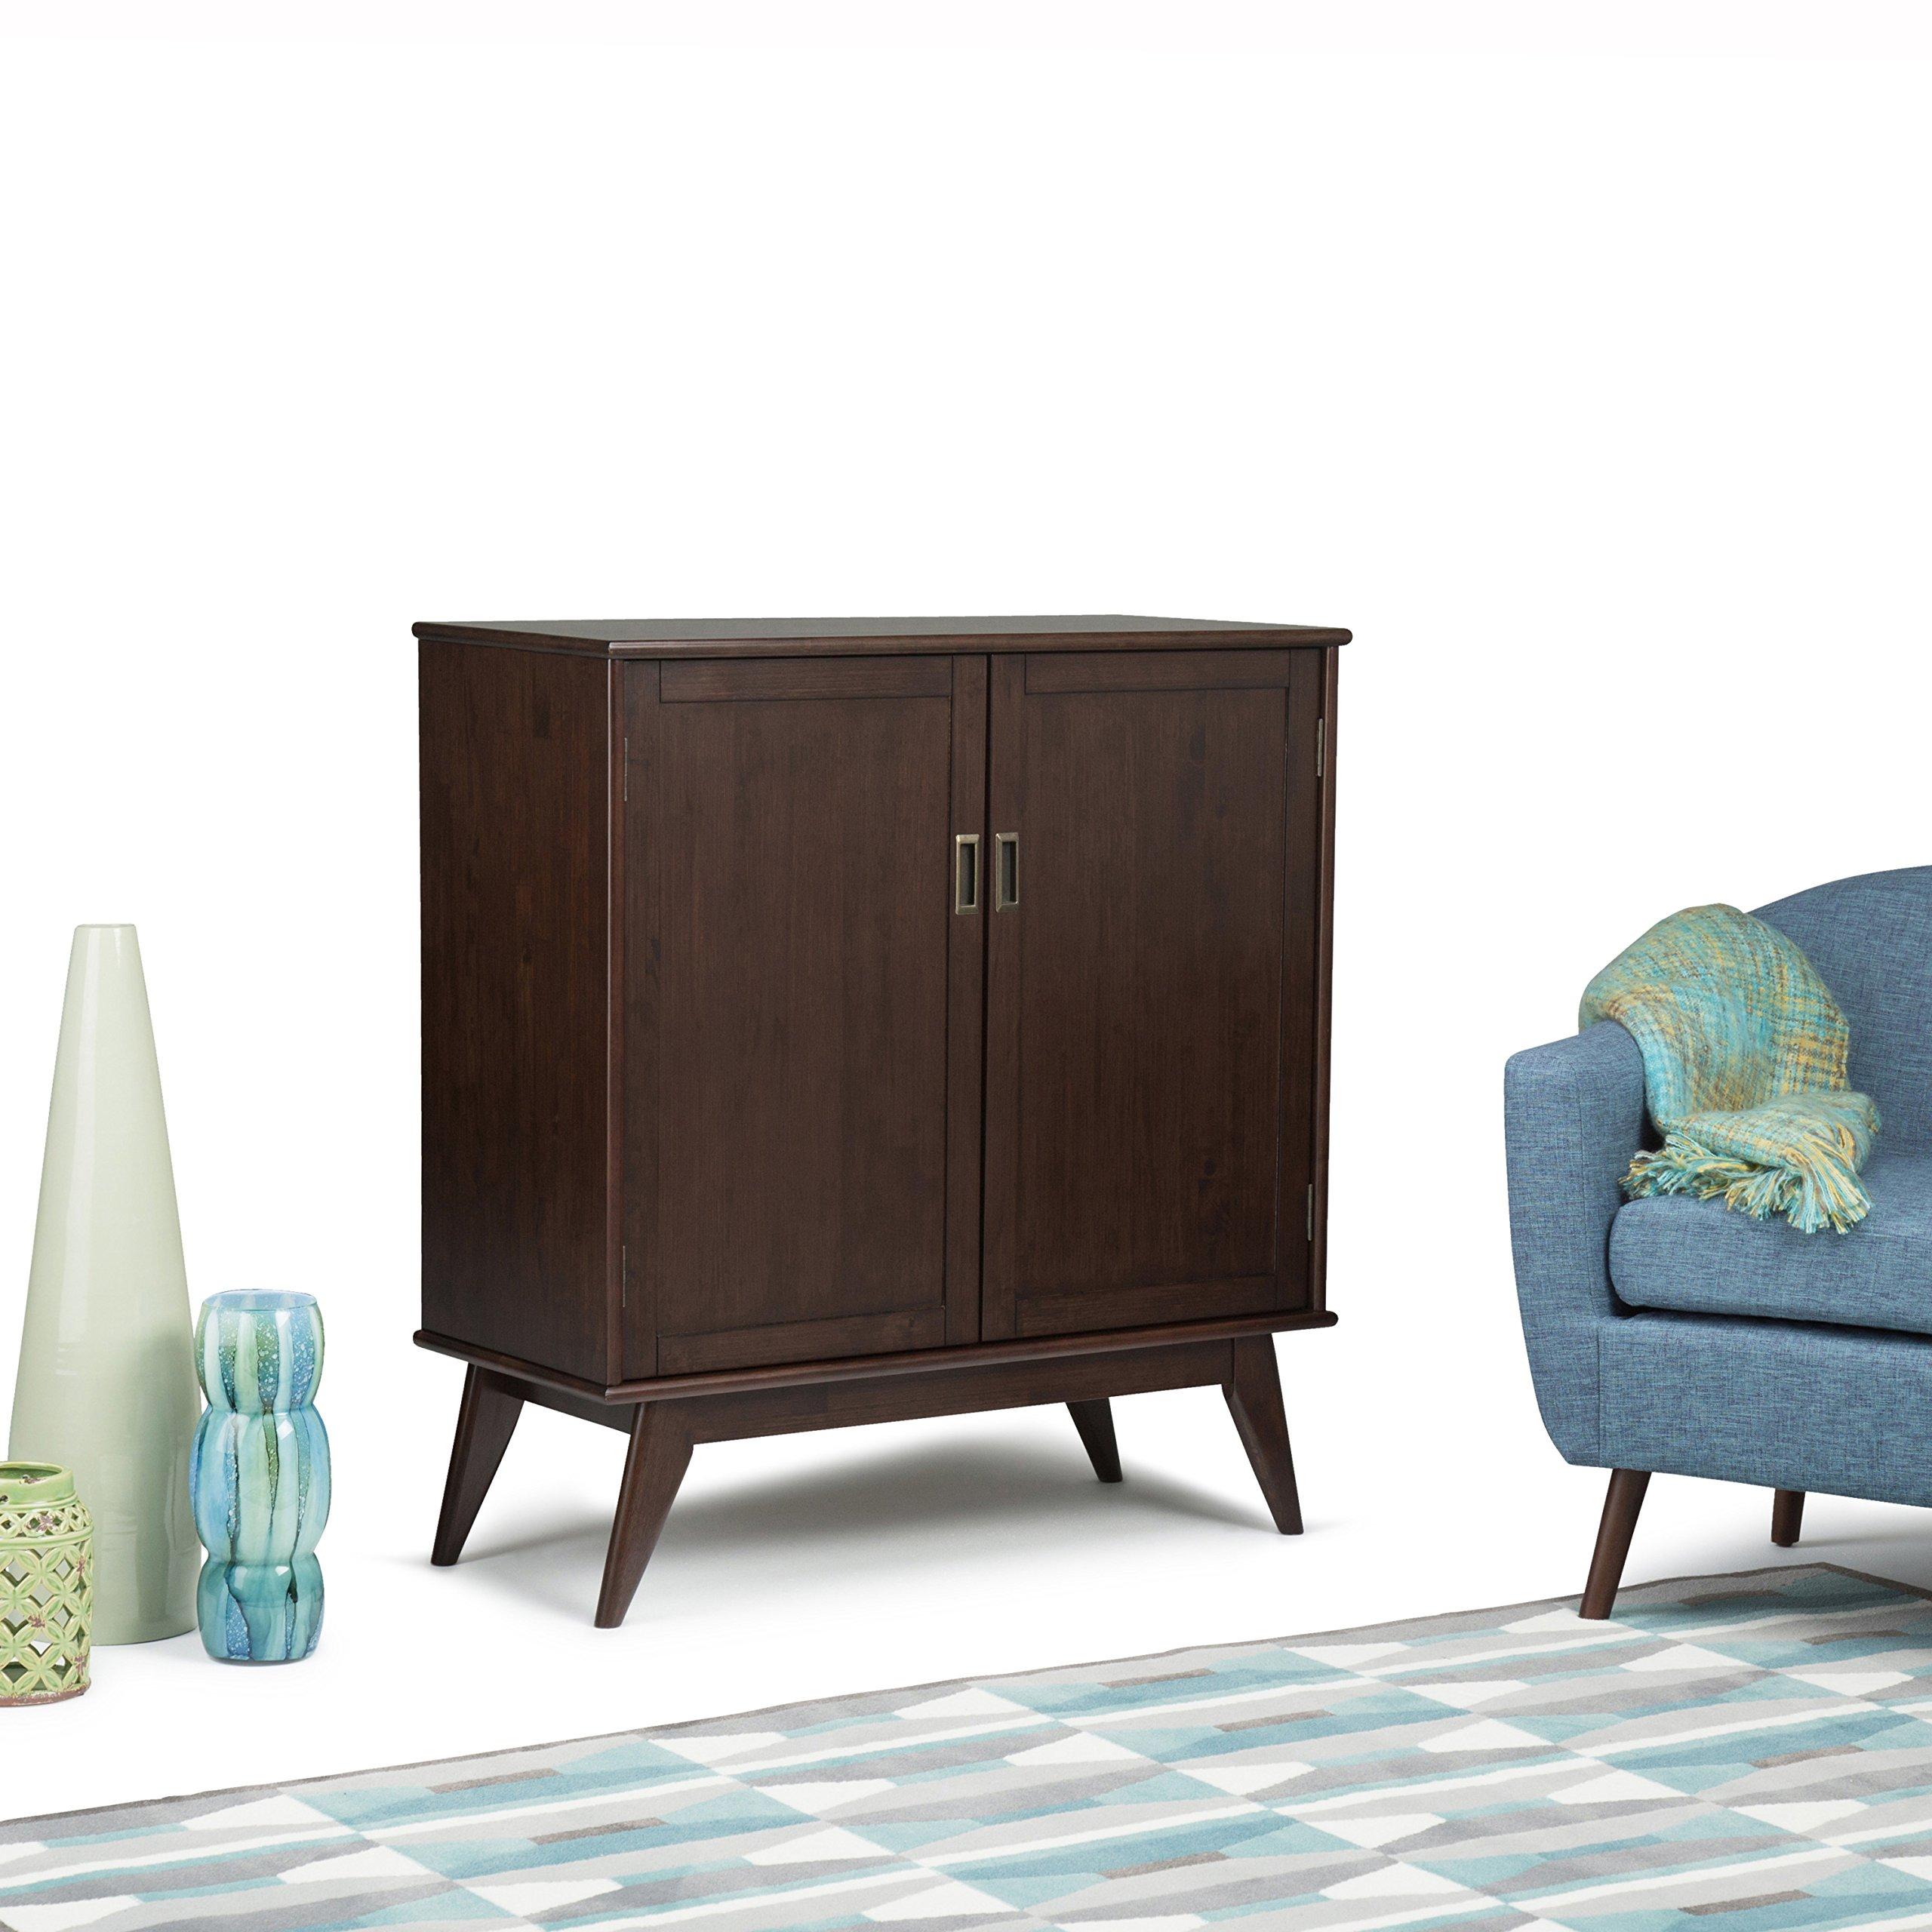 Simpli Home Draper Mid Century Solid Hardwood Storage Cabinet, Medium, Auburn Brown by Simpli Home (Image #2)